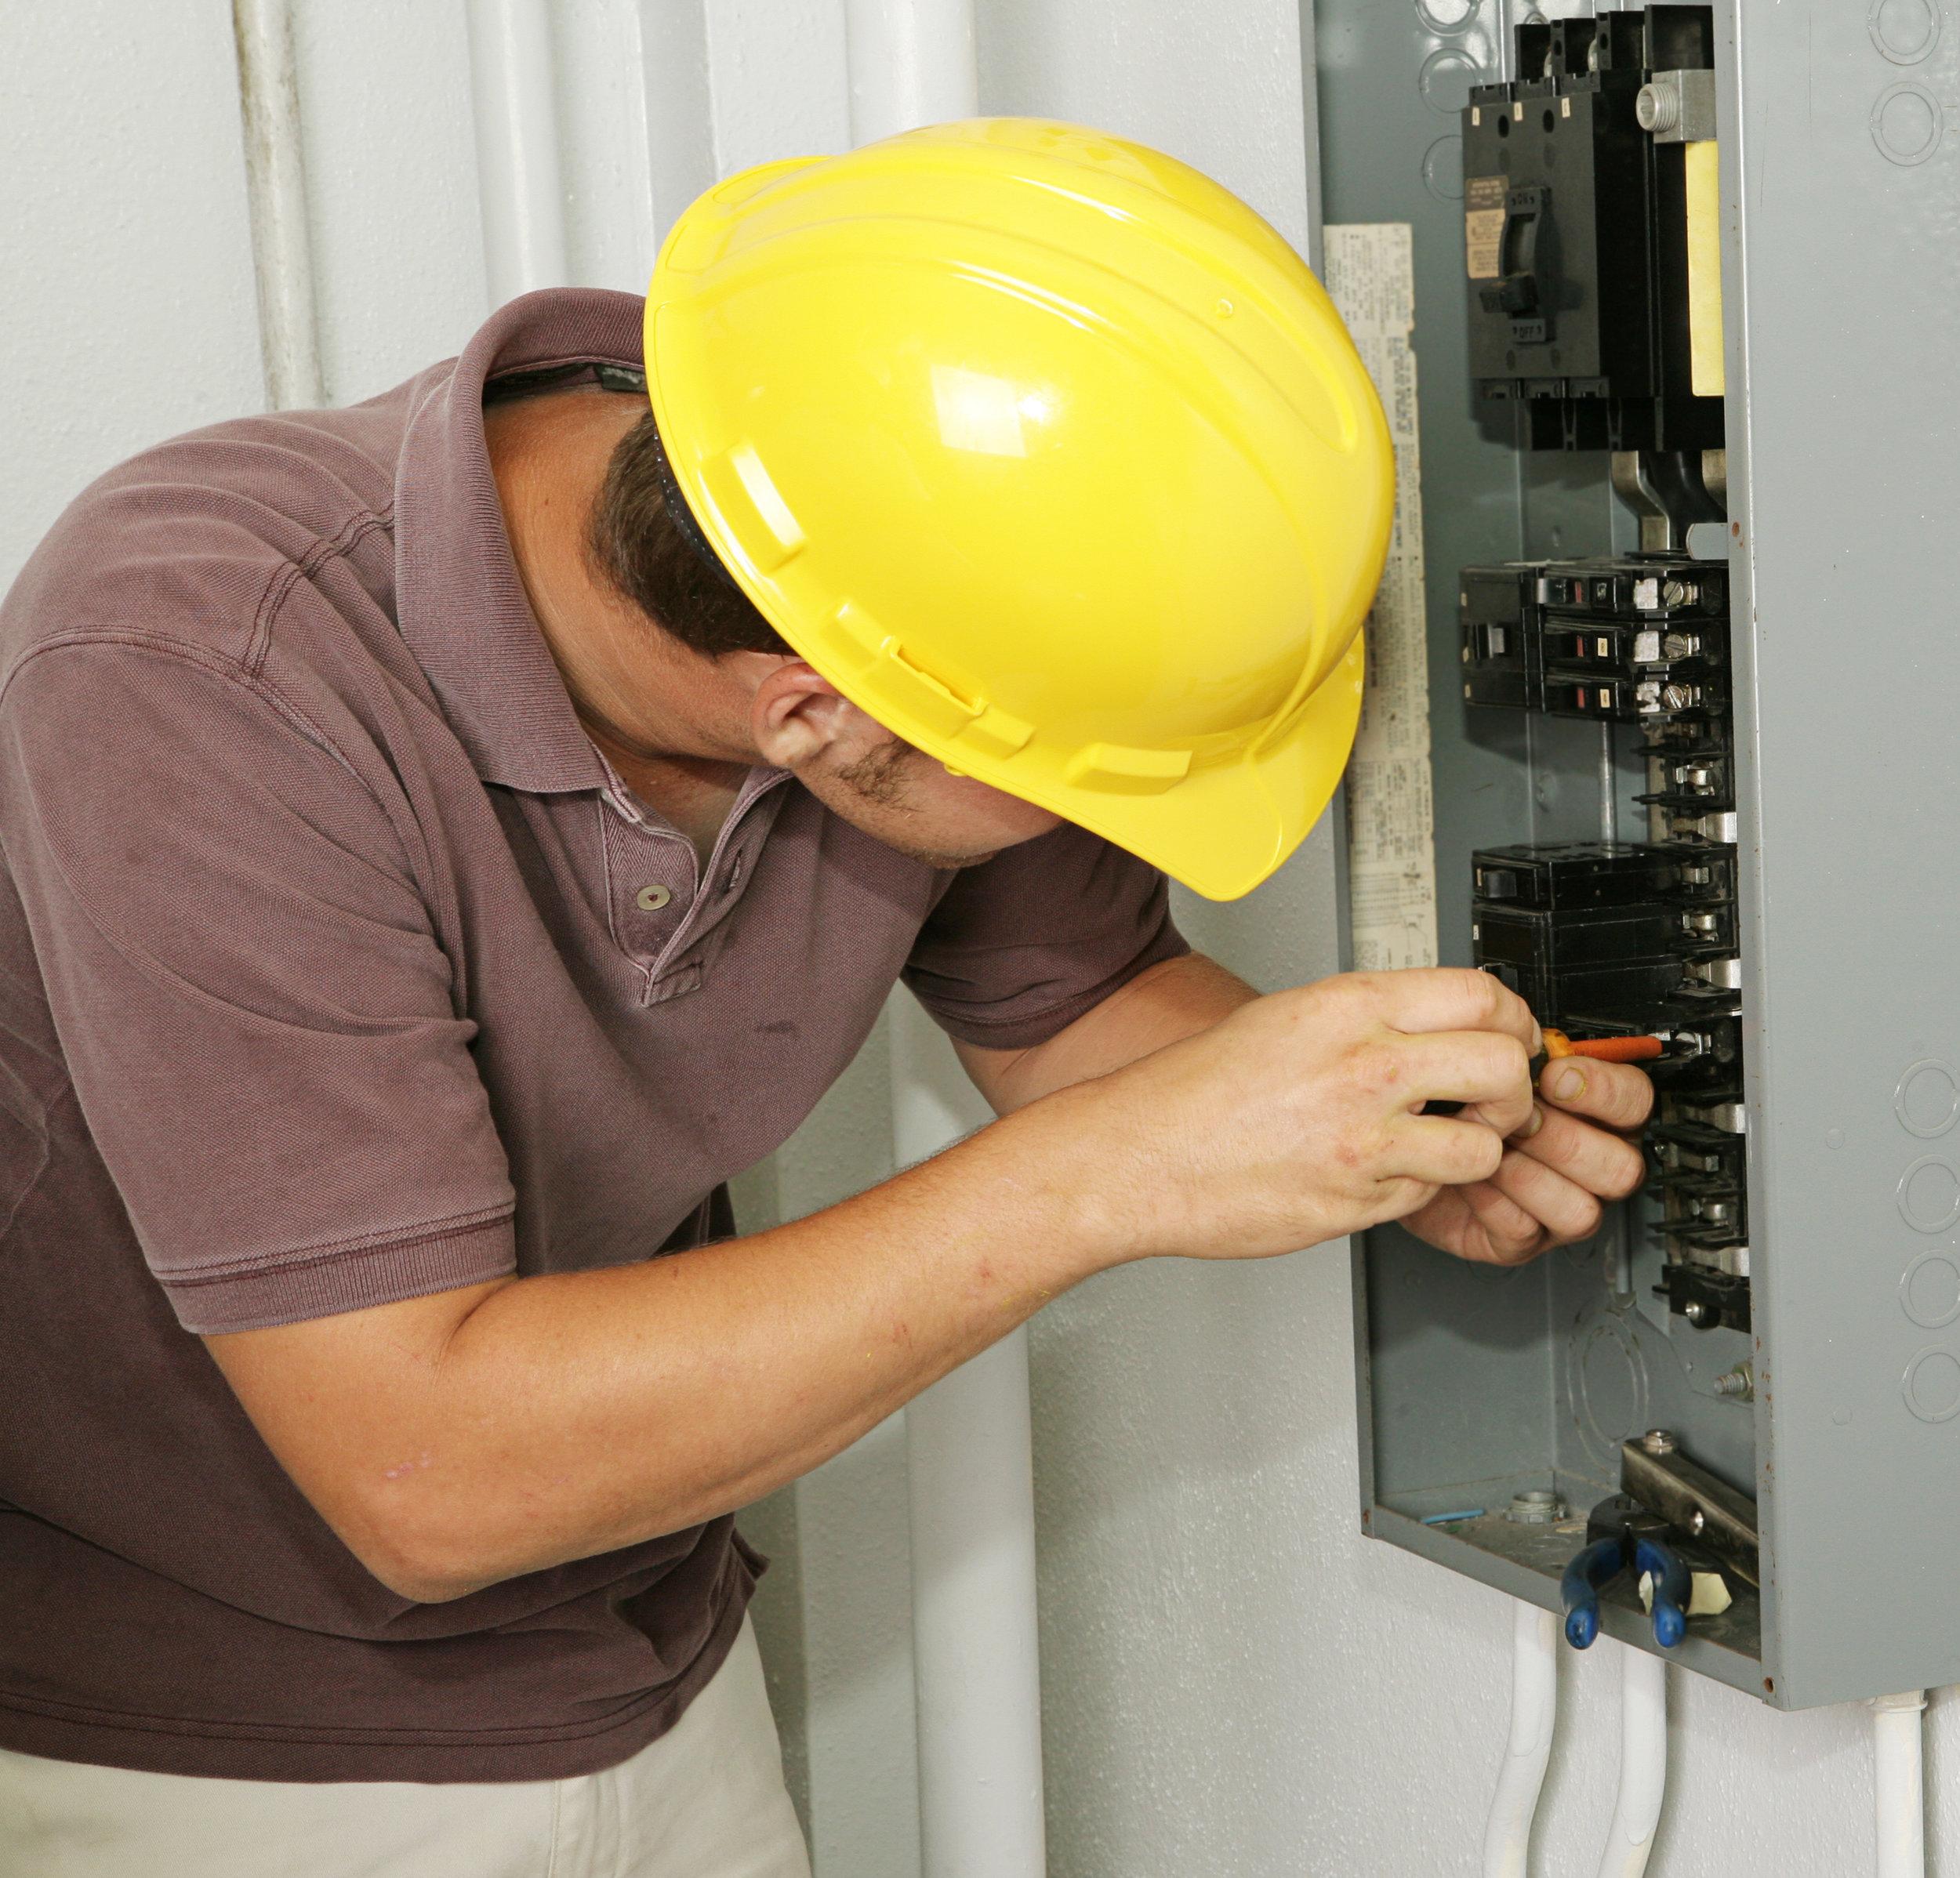 Electrical Main Panel 100 Amp Upgrade Sherwood Park Alberta | Electrical Main Panel 100 Amp Upgrade Fort Saskatchewan Alberta | Electrical Main Panel 100 Amp Upgrade St,.Albert Alberta